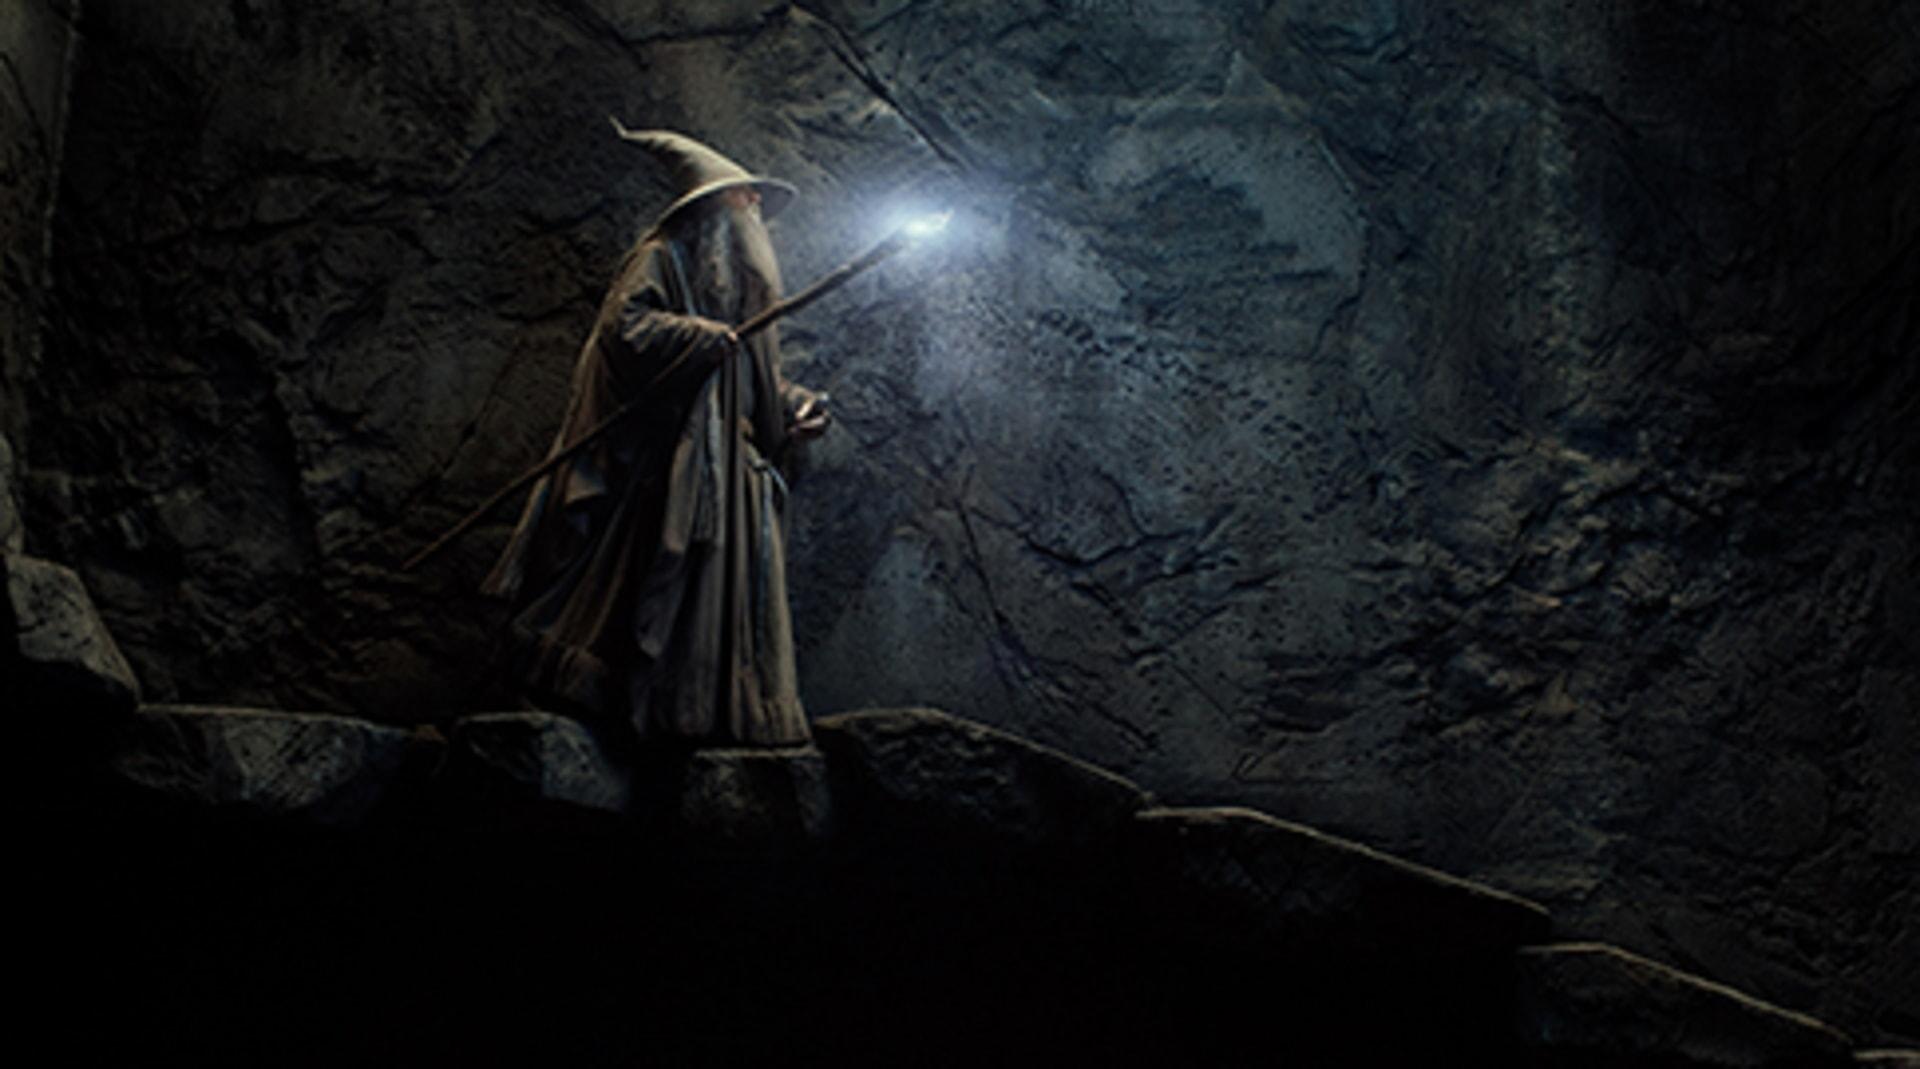 The Hobbit: The Desolation of Smaug - Image 7